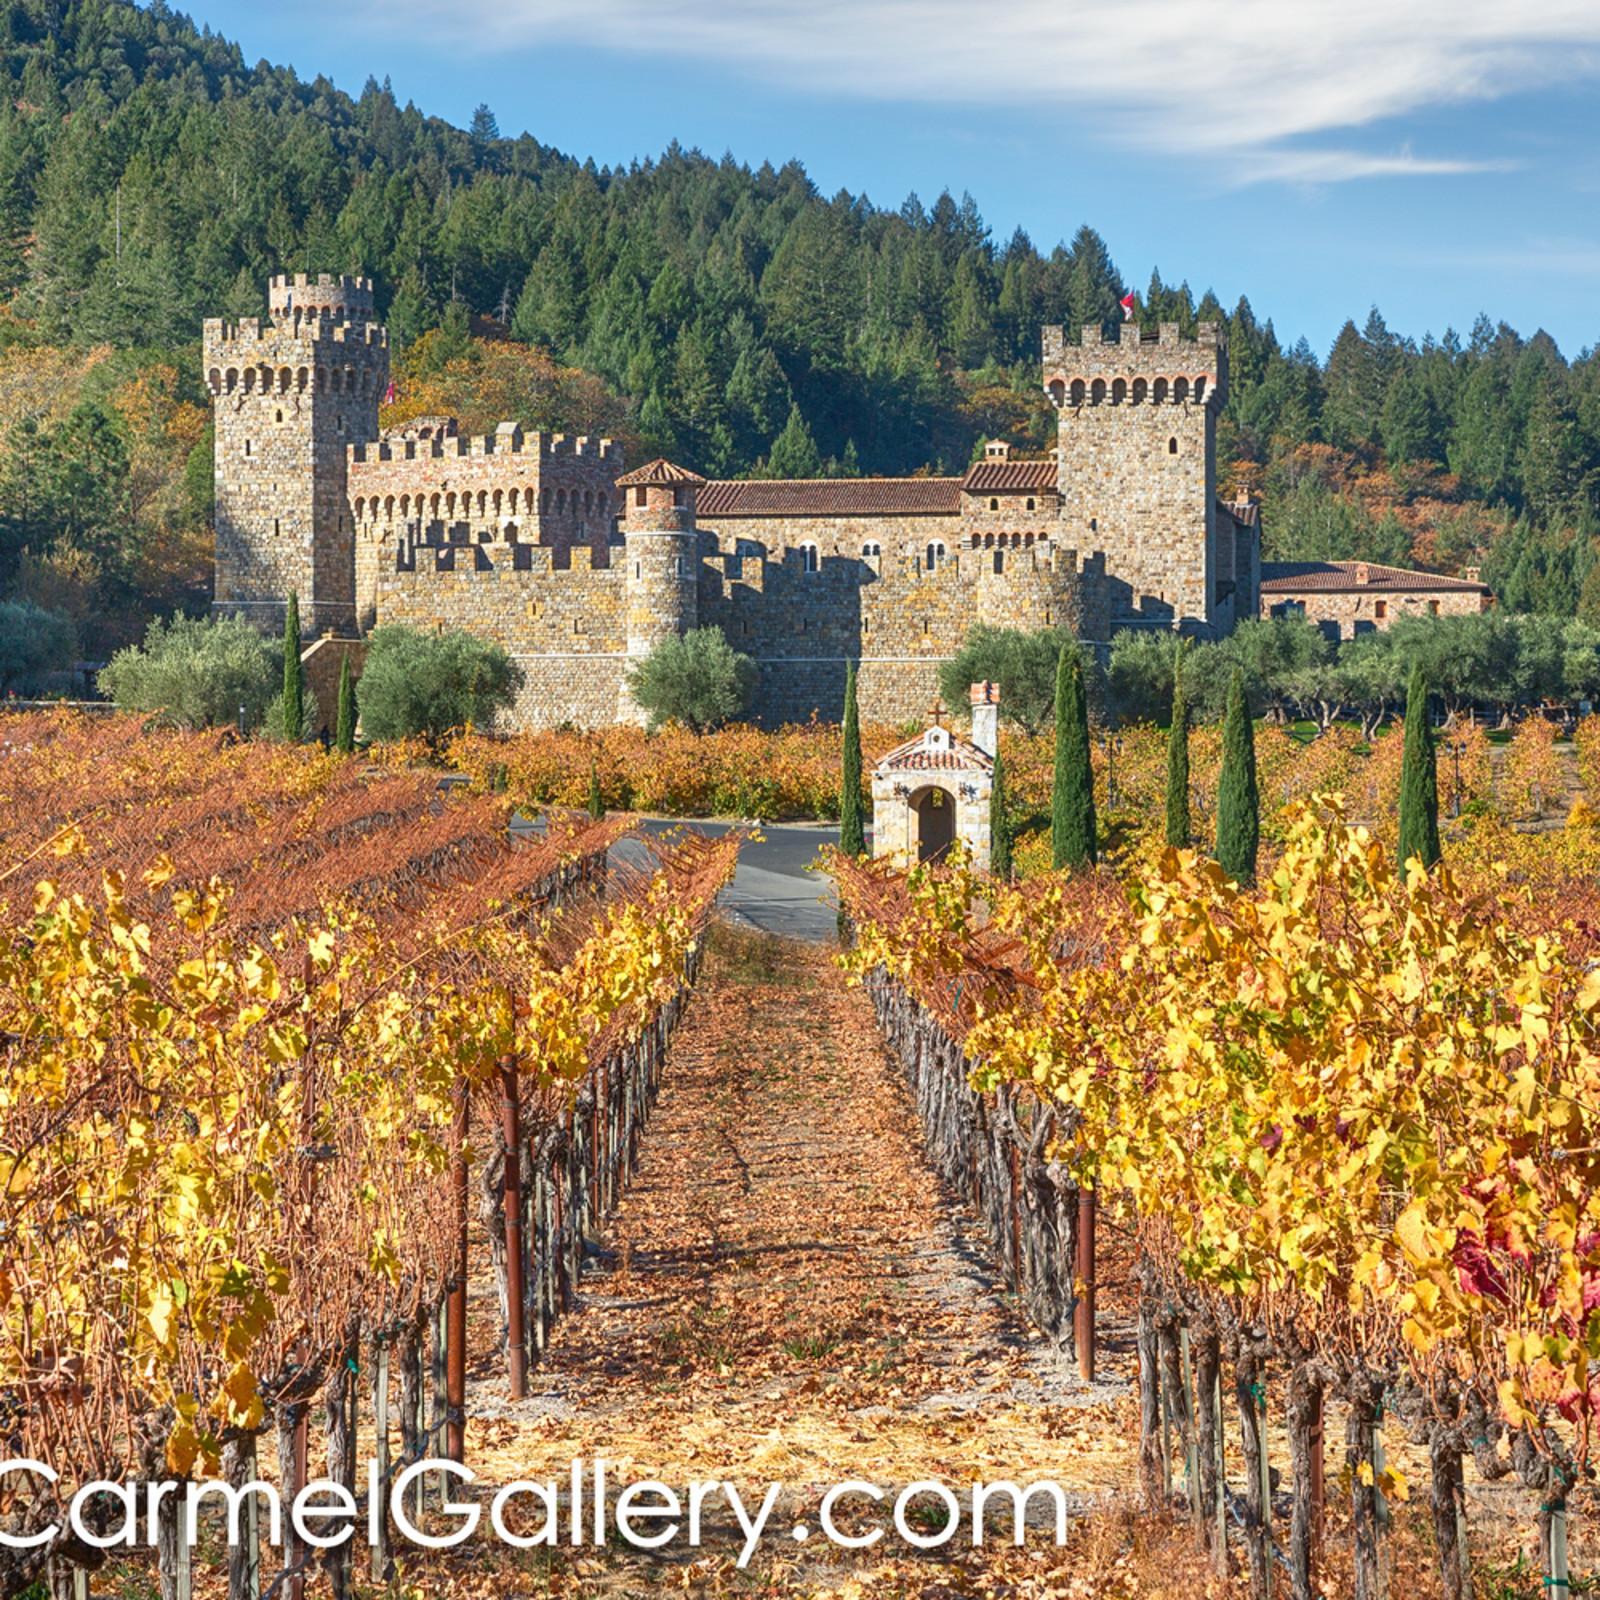 Autumn at the castle luijoe